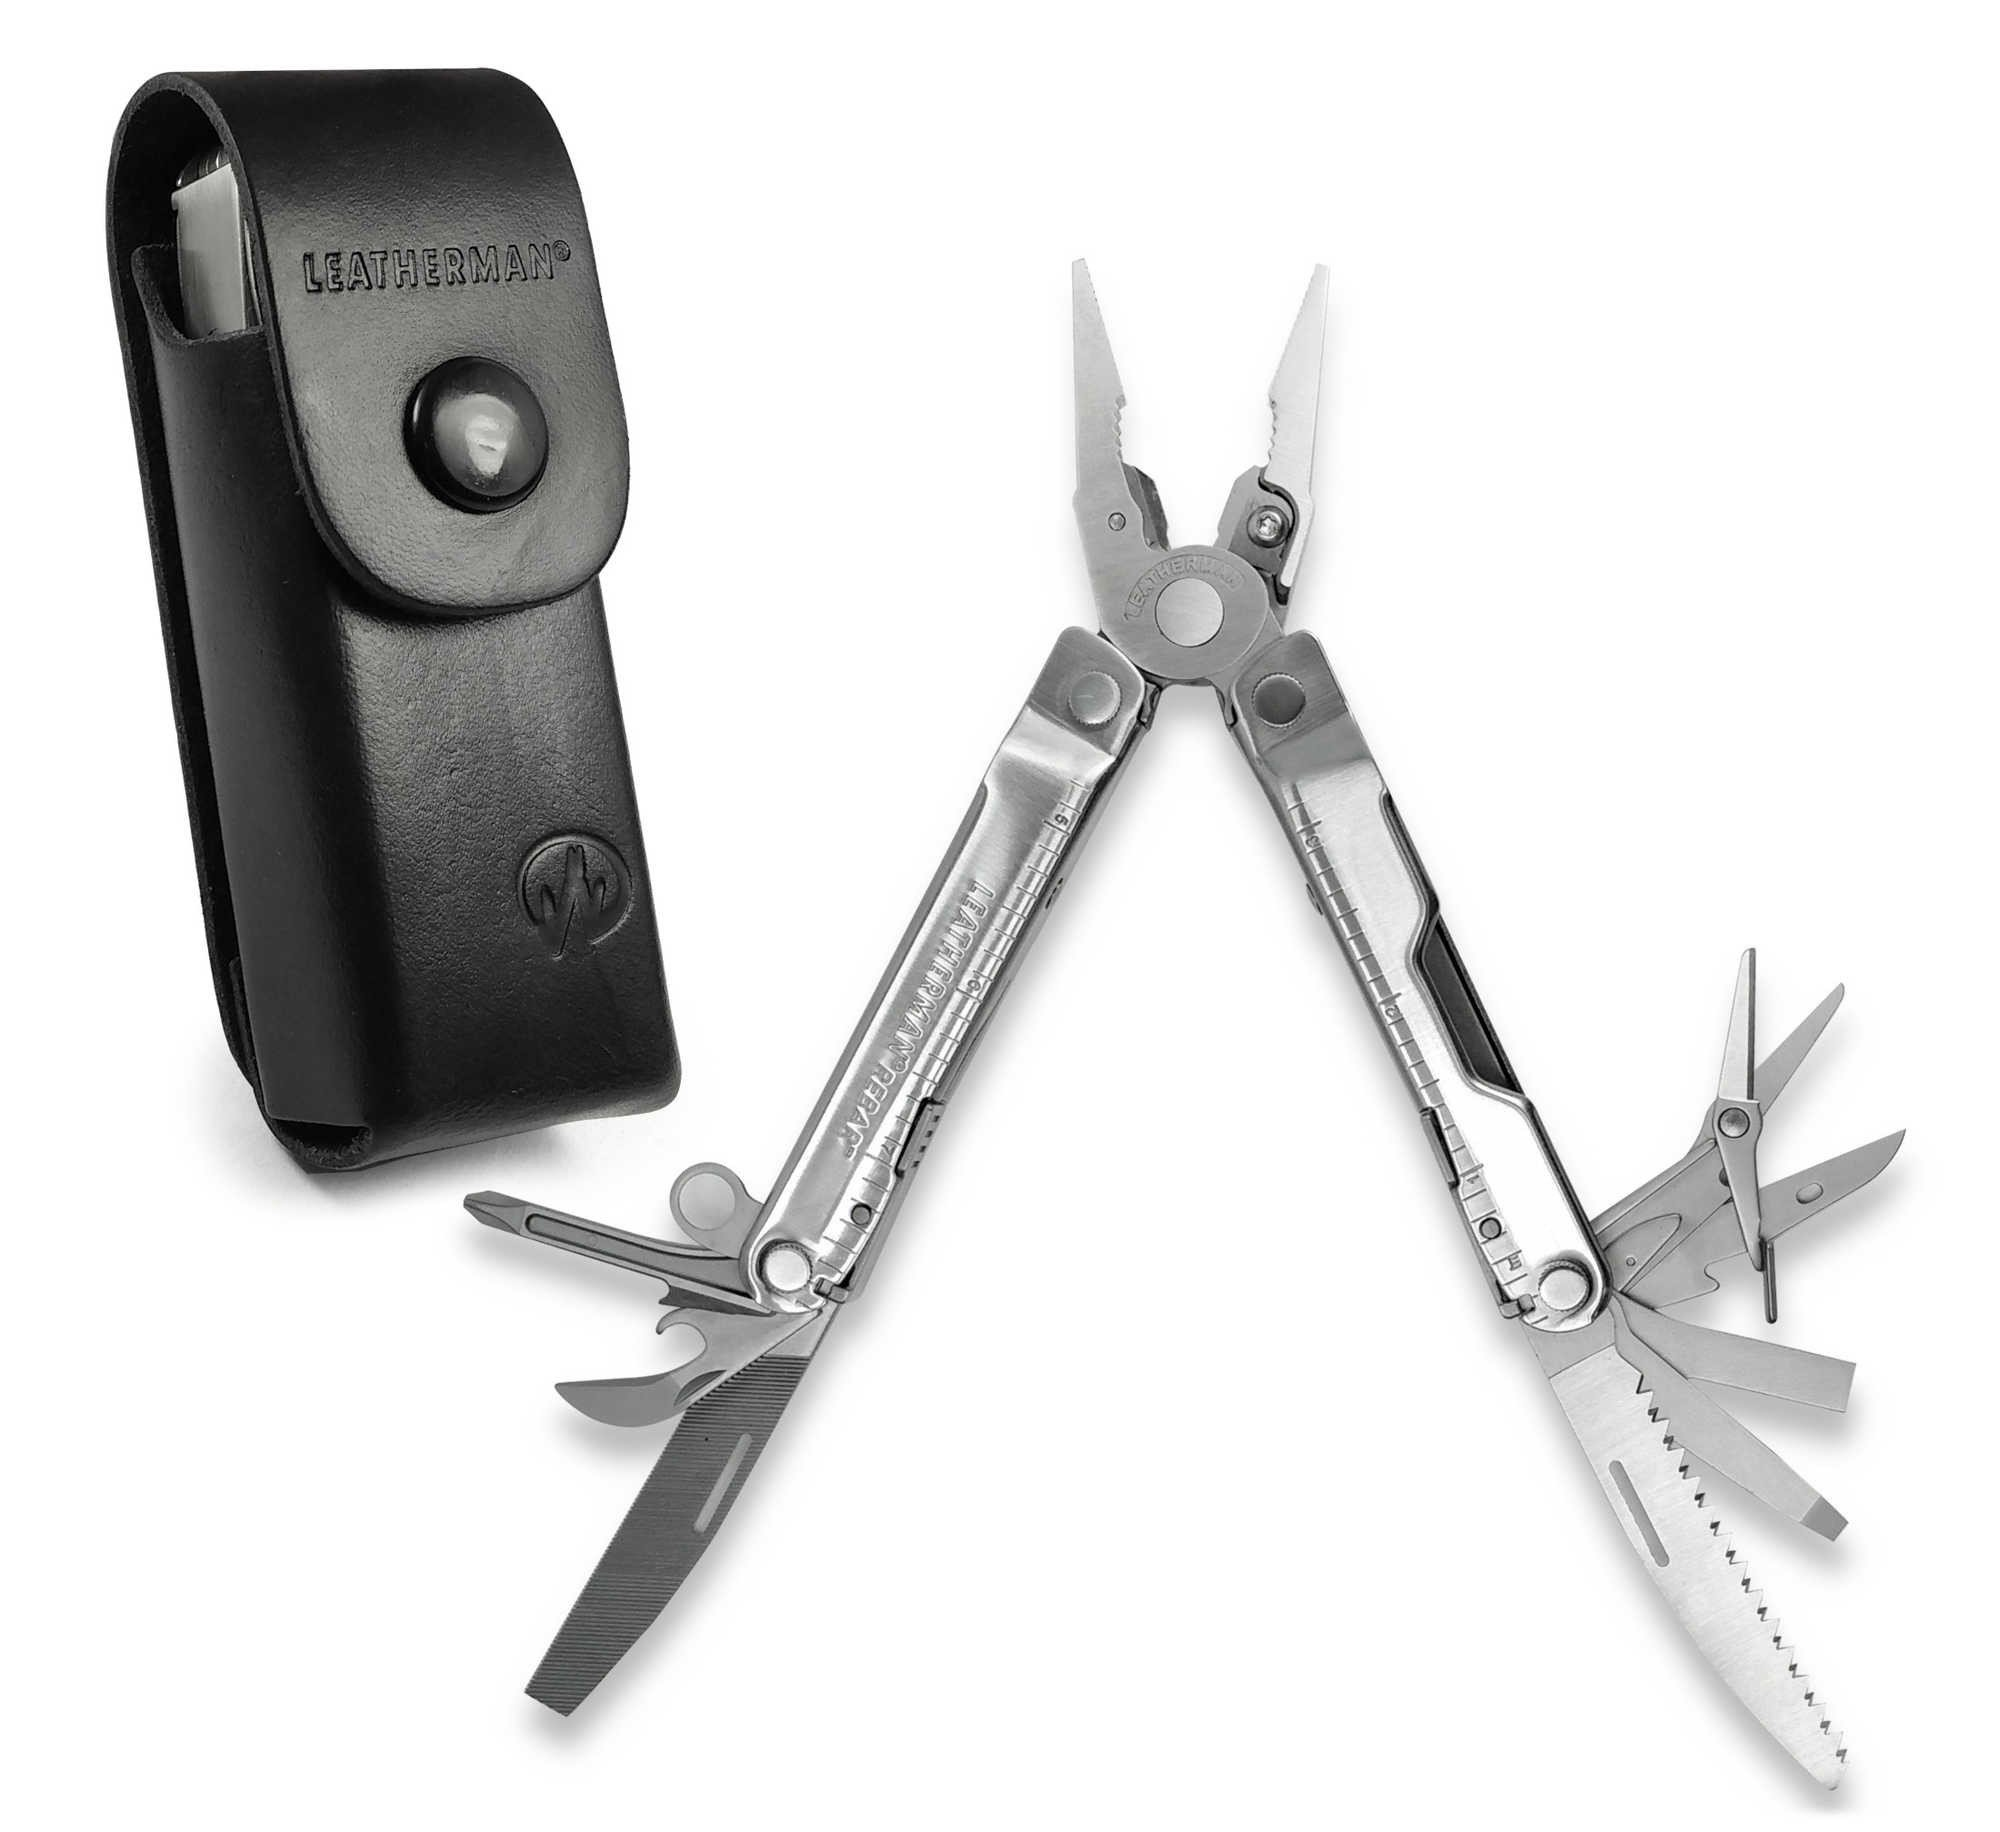 Leatherman Rebar EDC Multi Function Tool (With Personalised Case) - Silver Steel